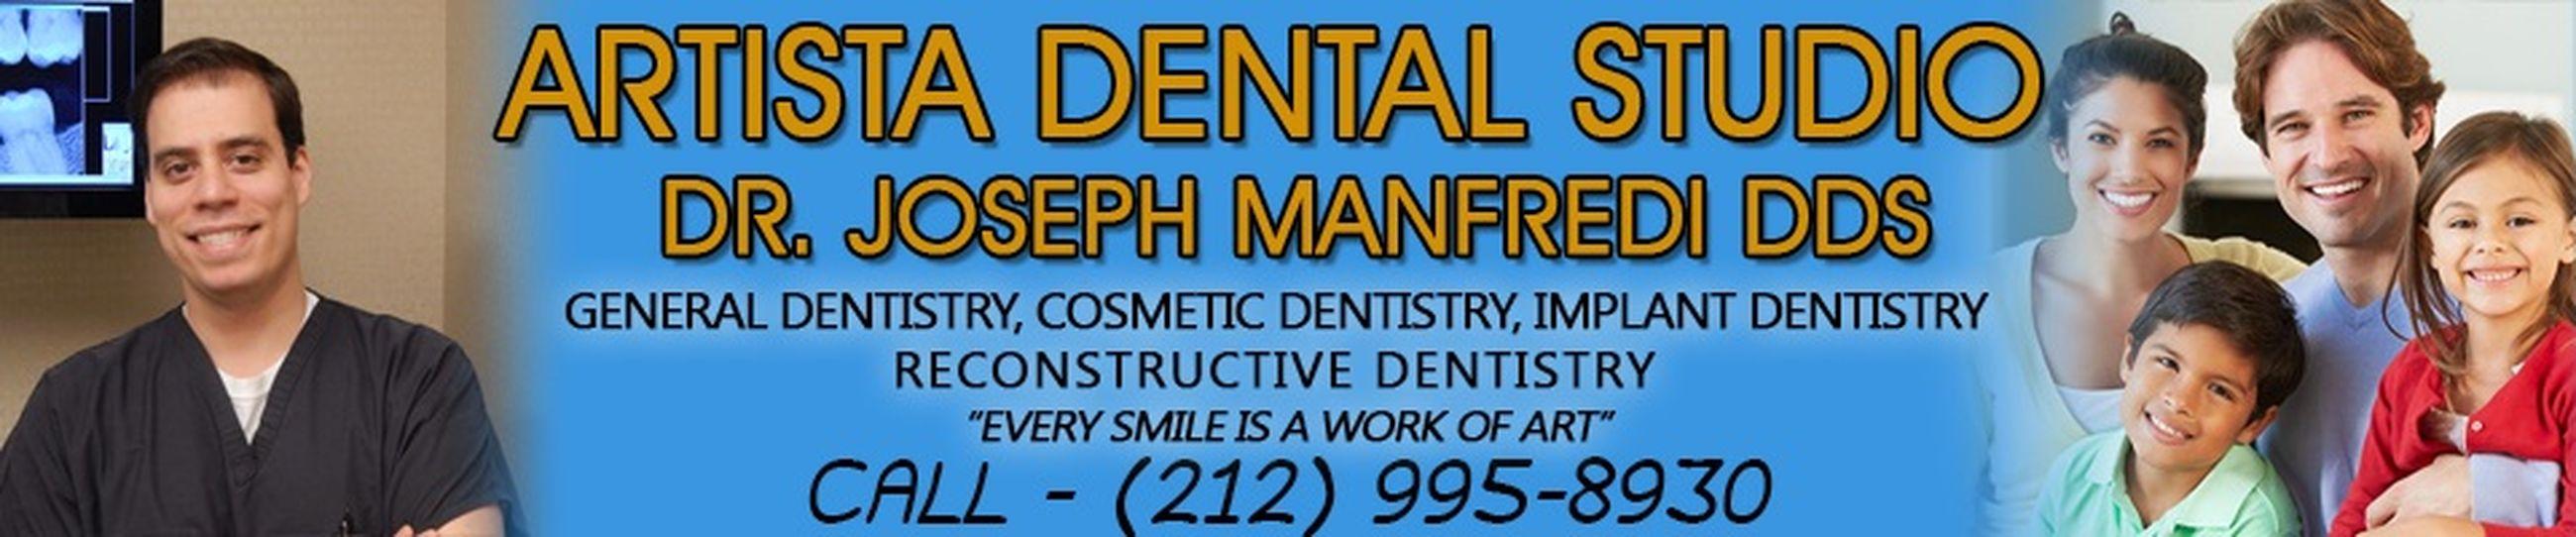 Artista Dental Studio, Dr. Joseph Manfredi DDS 250 Park Ave S #202 New York, NY 10003 (212) 995-8930 Cosmetic Dentist Gramercy Park Dental Implants Gramercy Park Invisalign Gramercy Park Orthodontist Gramercy Park Veneers Gramercy Park